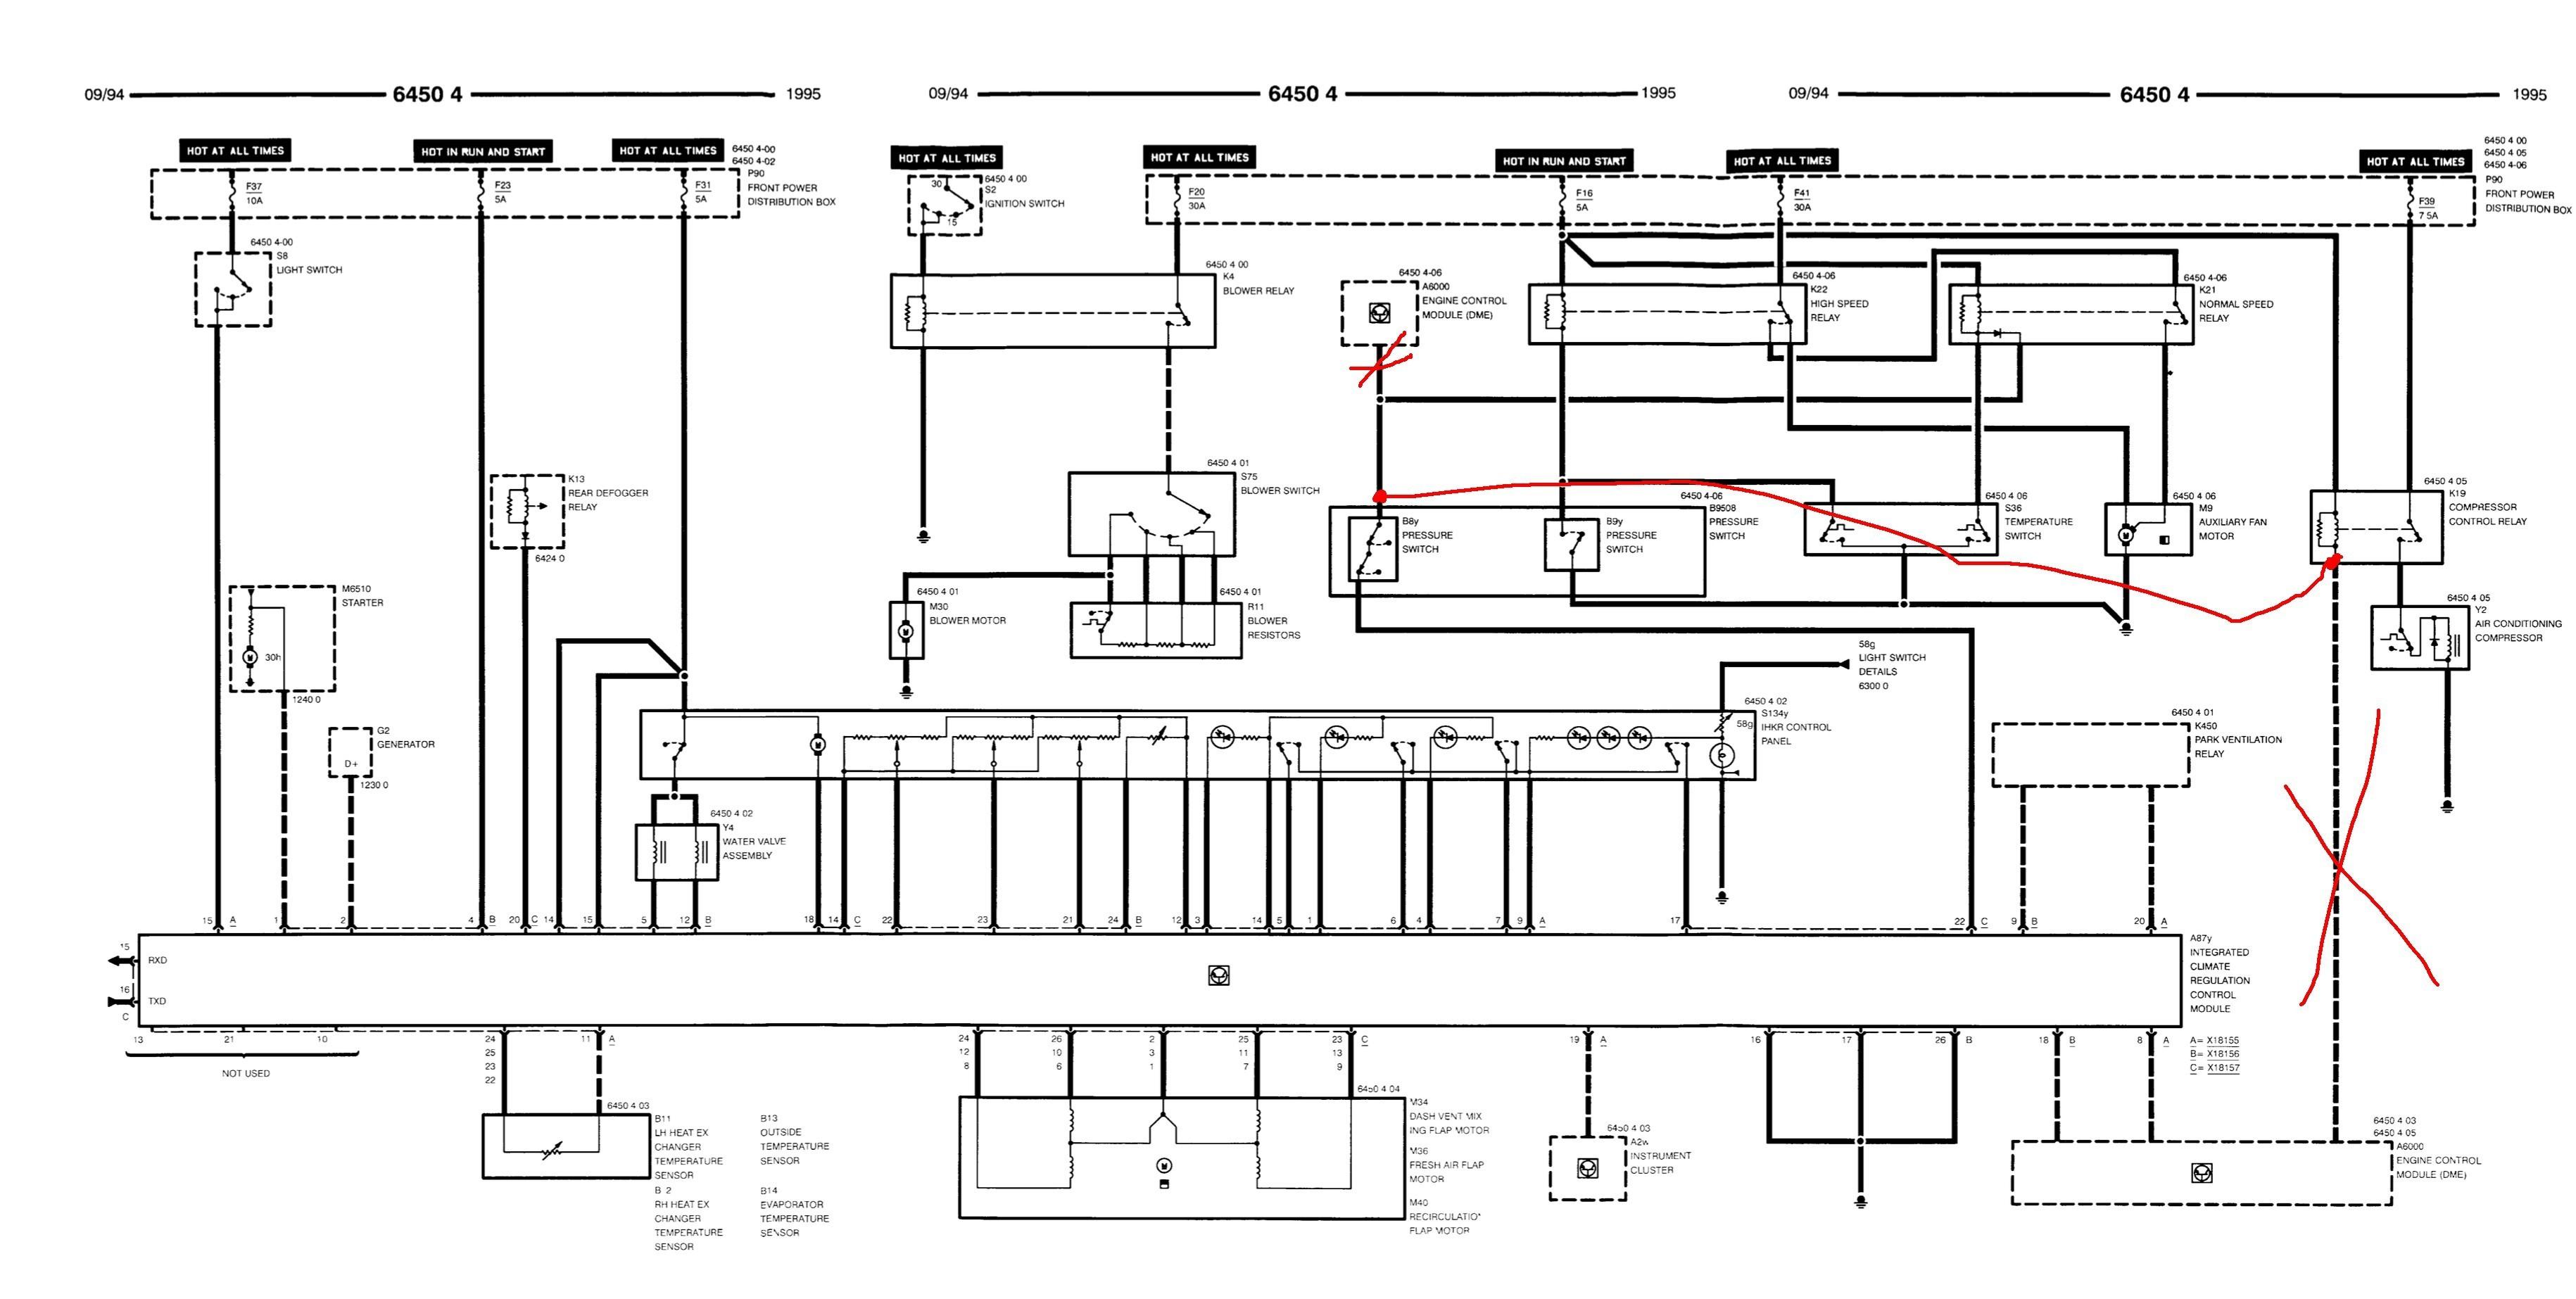 Brilliant Bmw E36 Heater Control Wiring Diagram Wiring Diagram Database Wiring Cloud Faunaidewilluminateatxorg